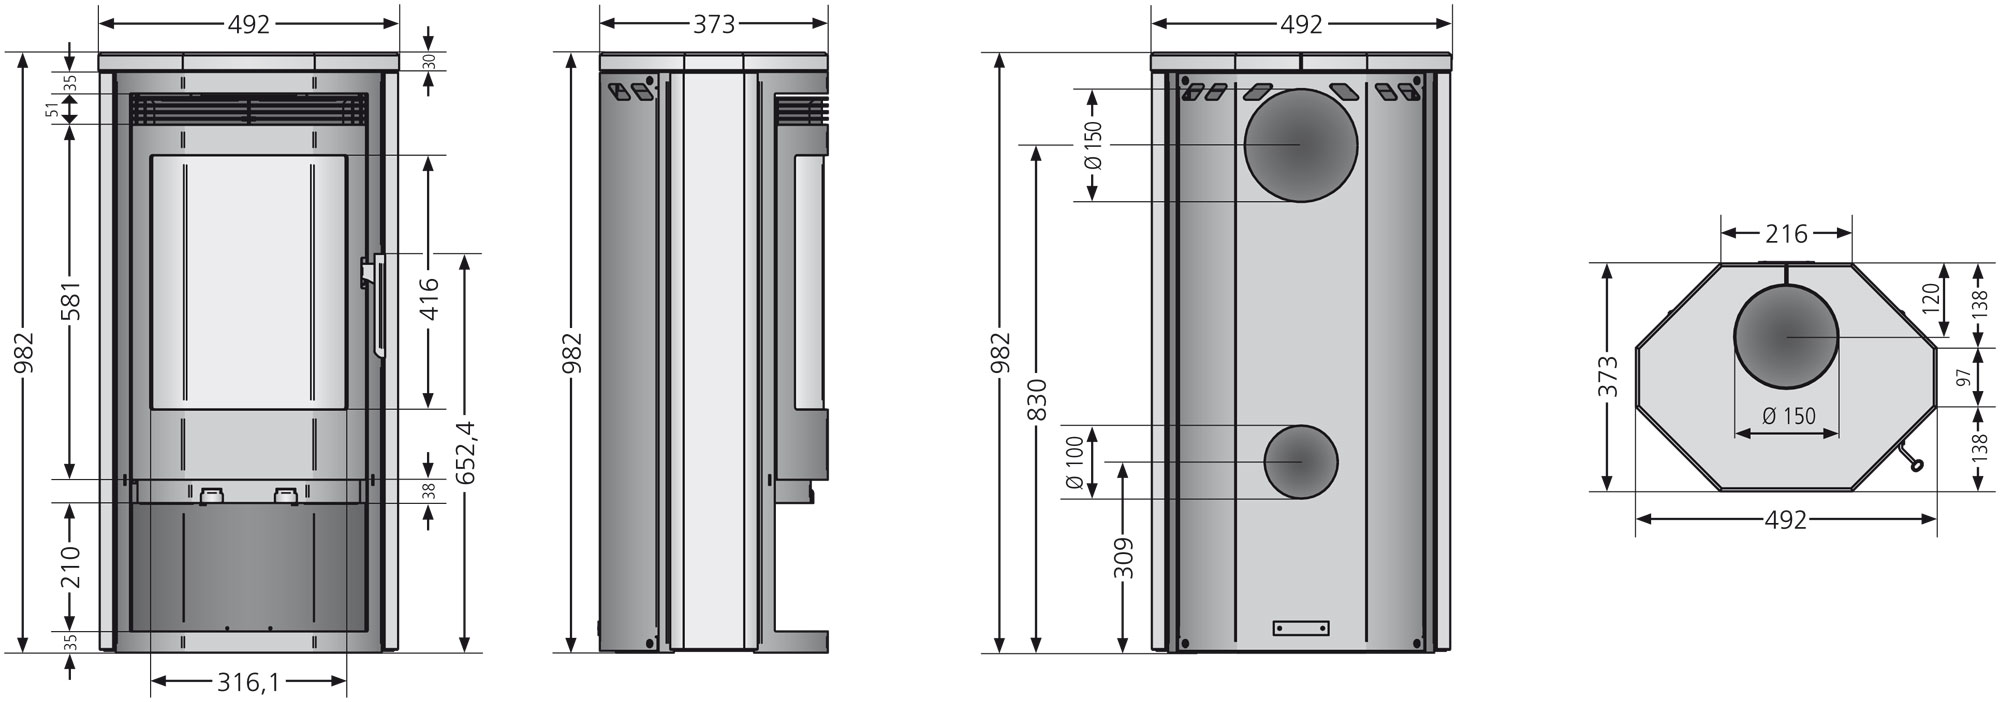 Kaminofen Justus Usedom 5 Speckstein grau raumluftunabhängig 5 kW Bild 2